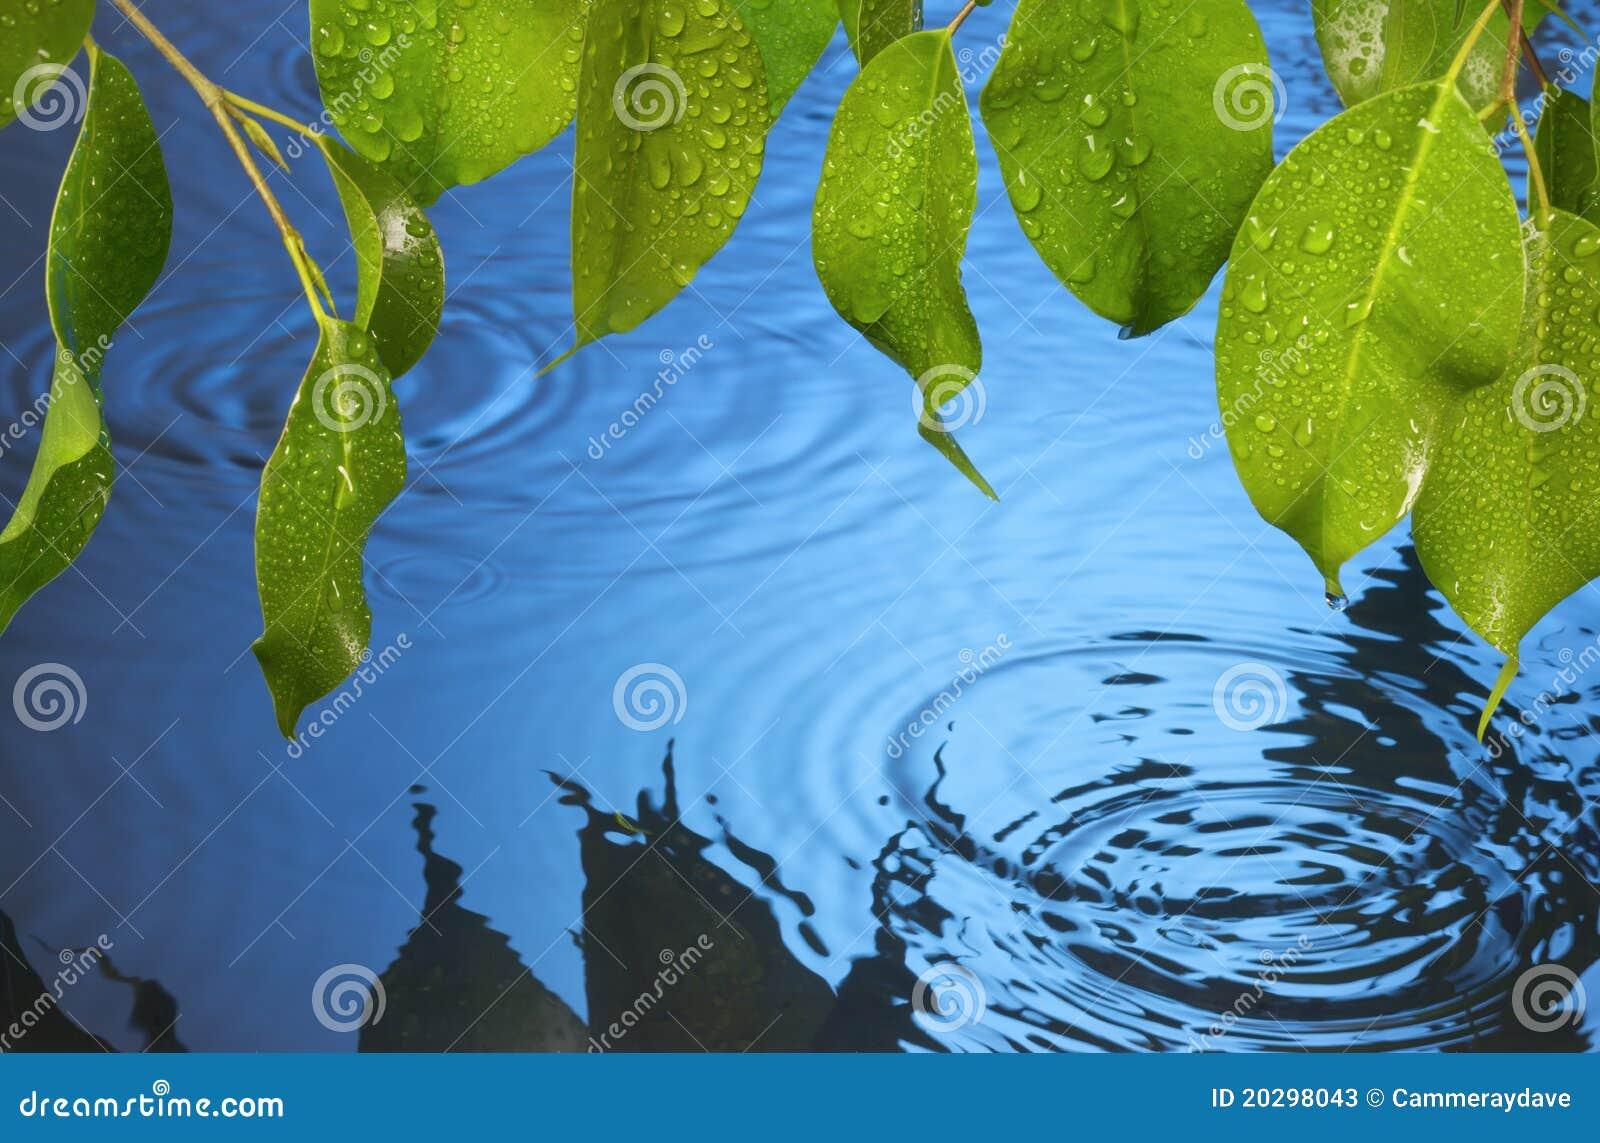 Water Ripples Leaves Rain Background